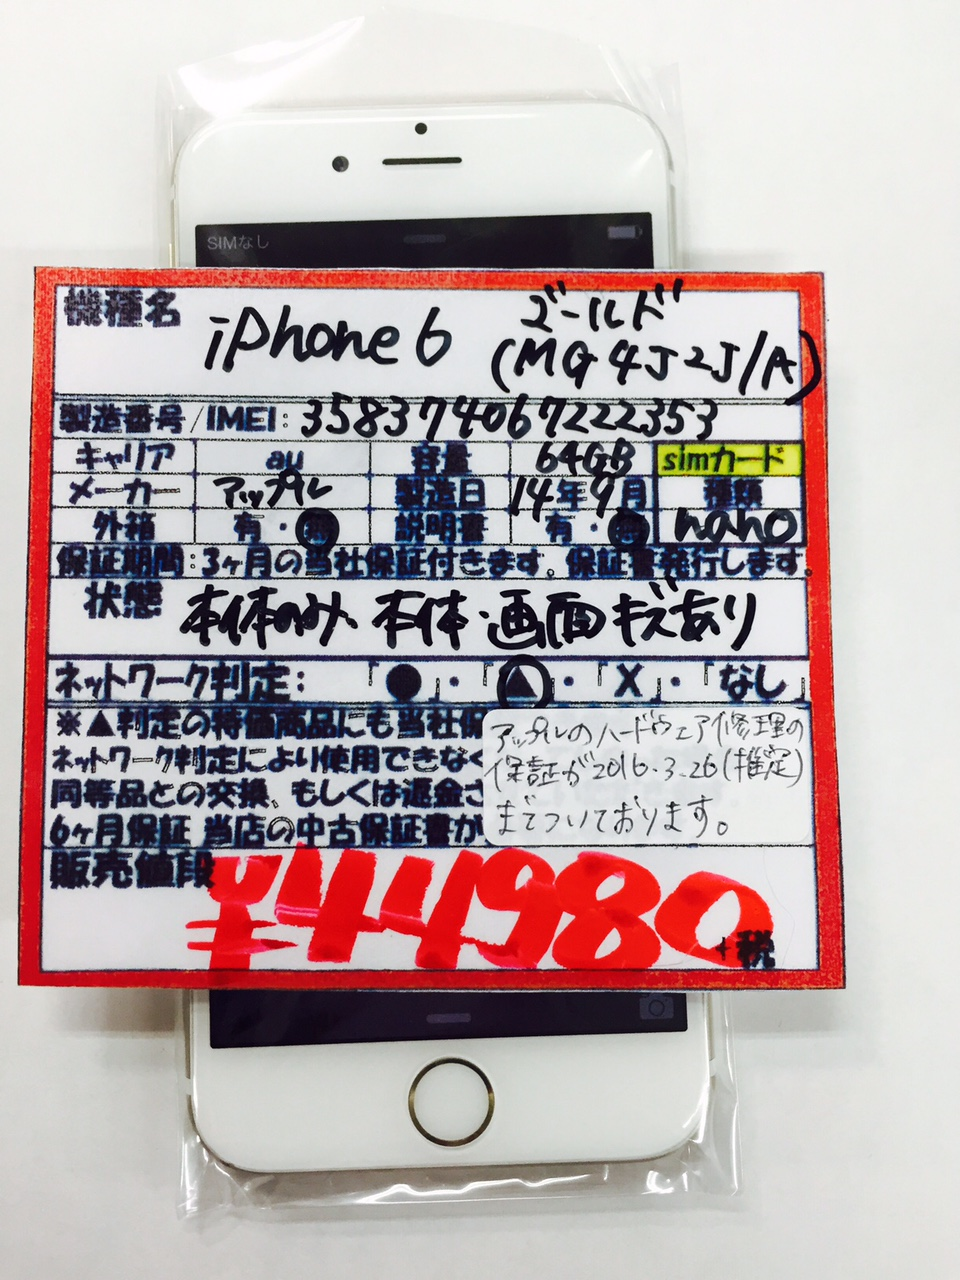 iPhone6 MG4J2JA 本体のみ ゴールド